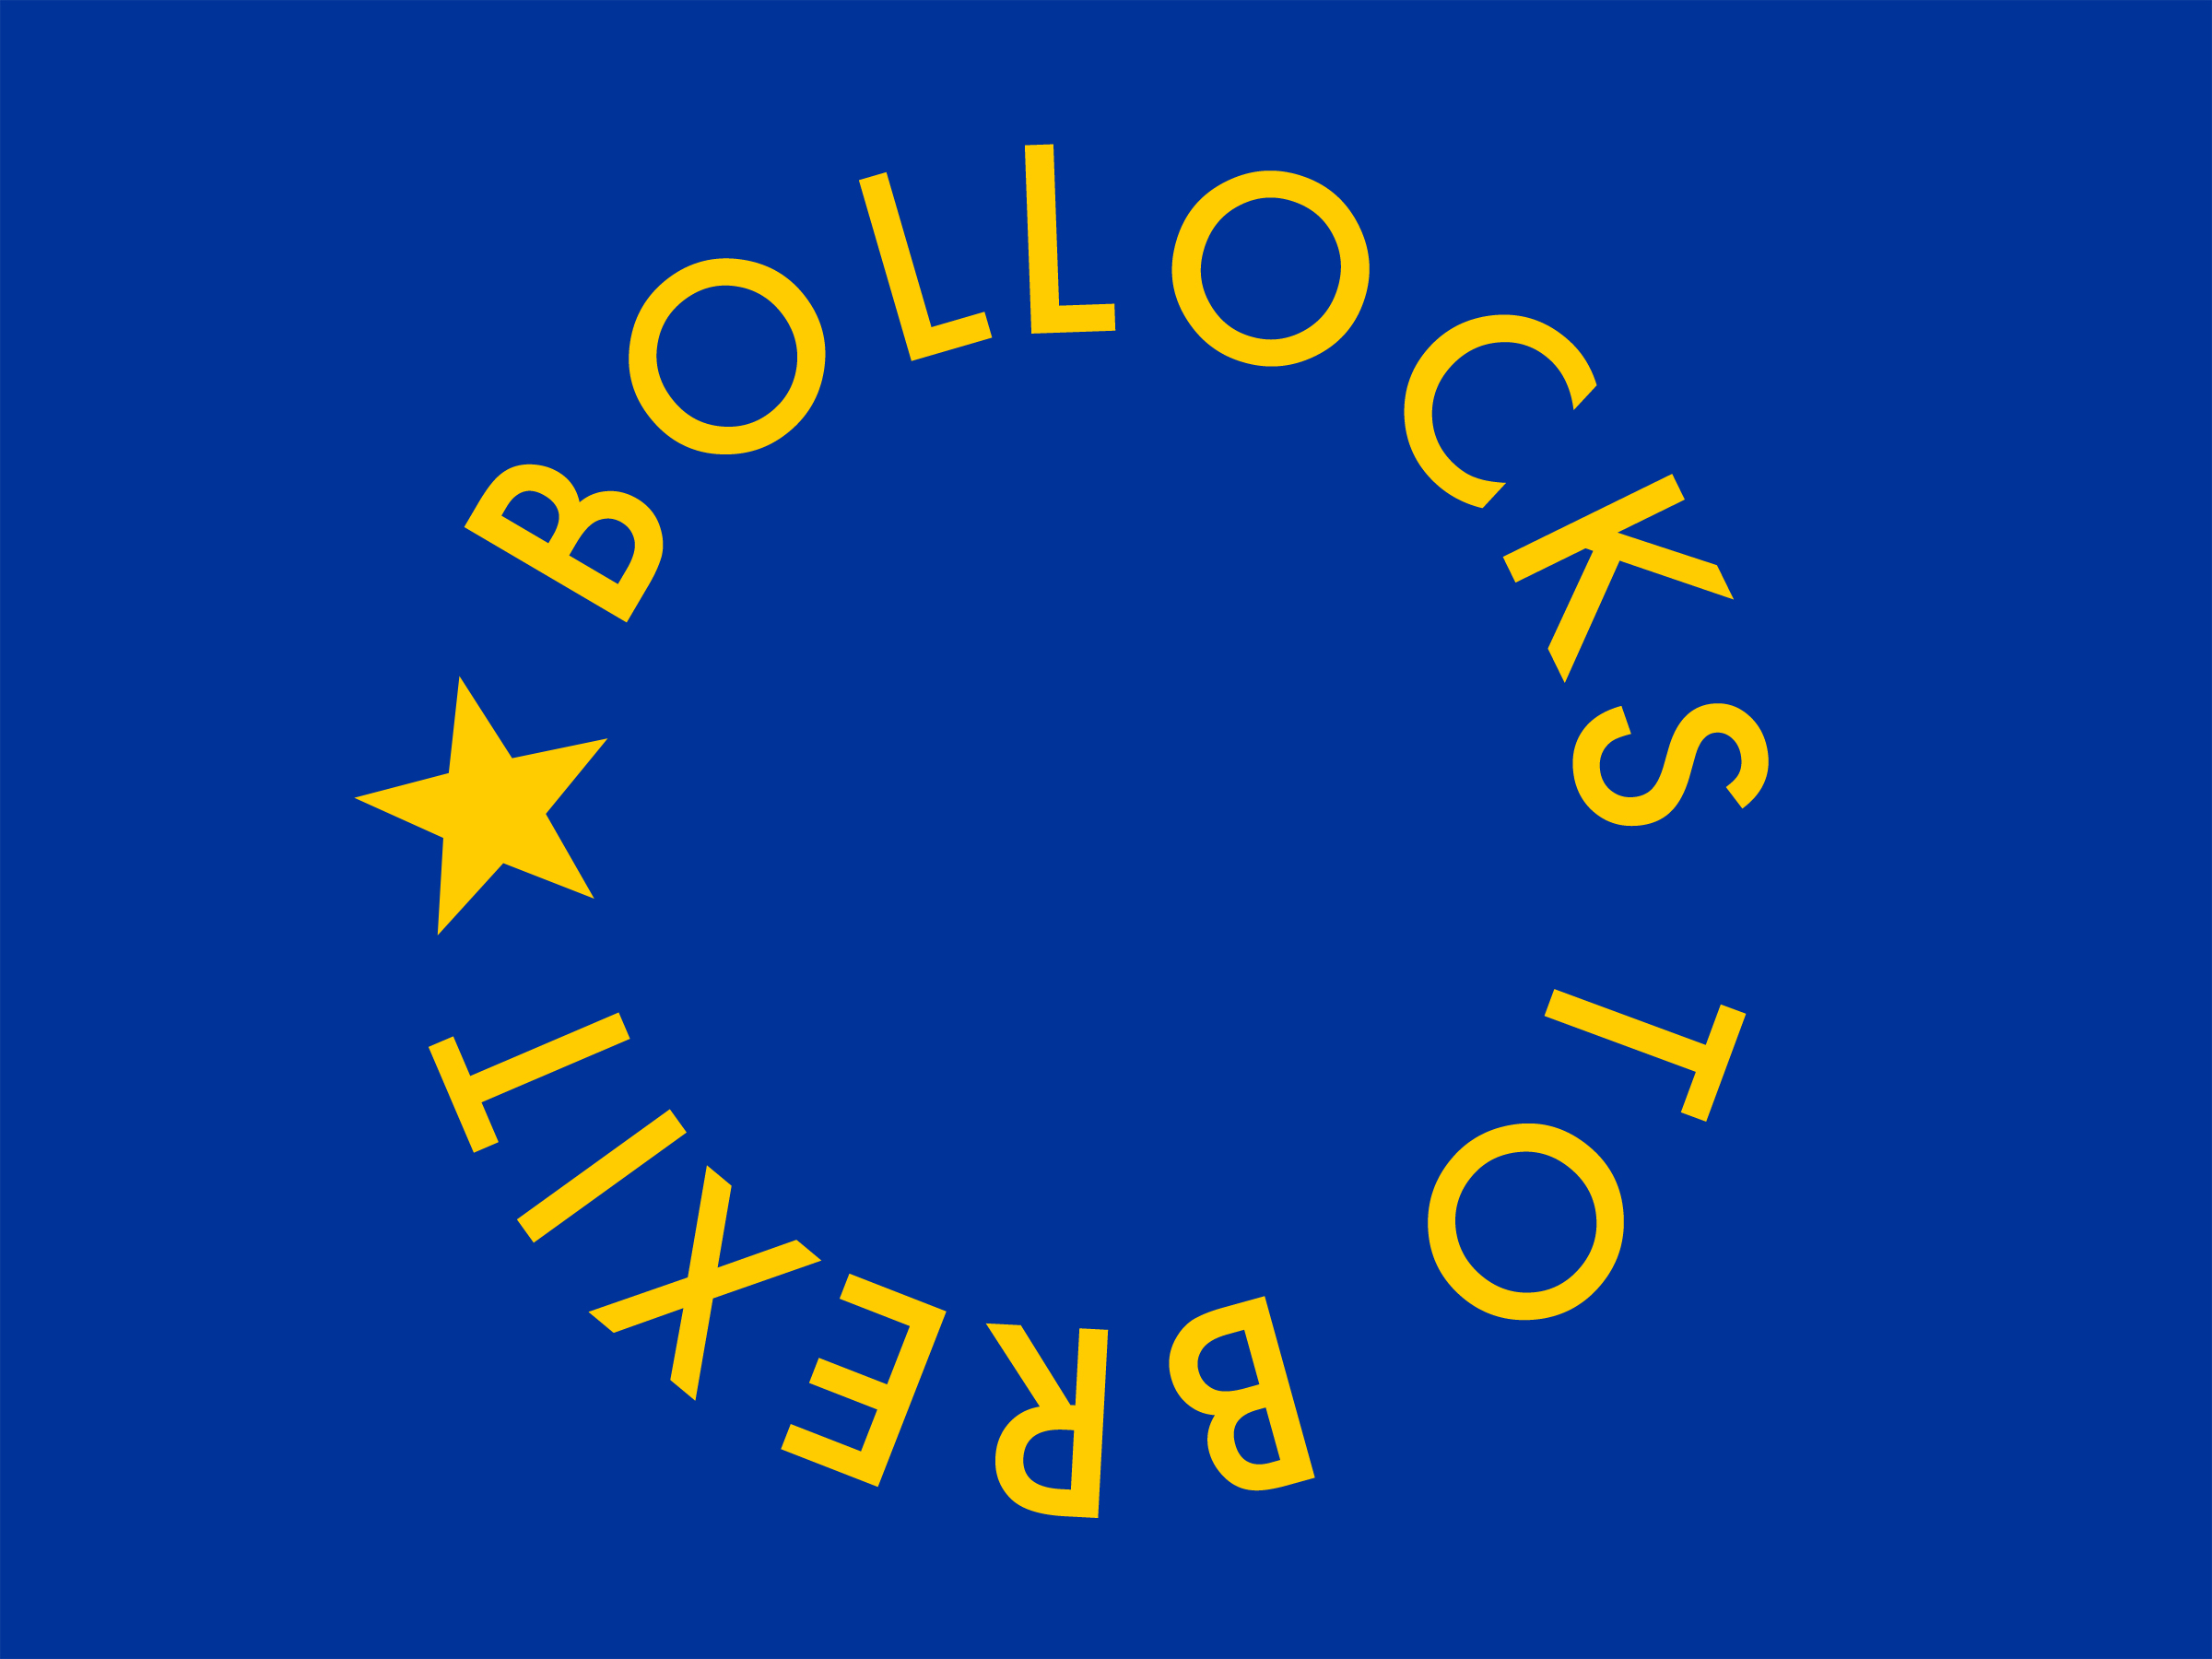 bollocks to brexit 04 full size